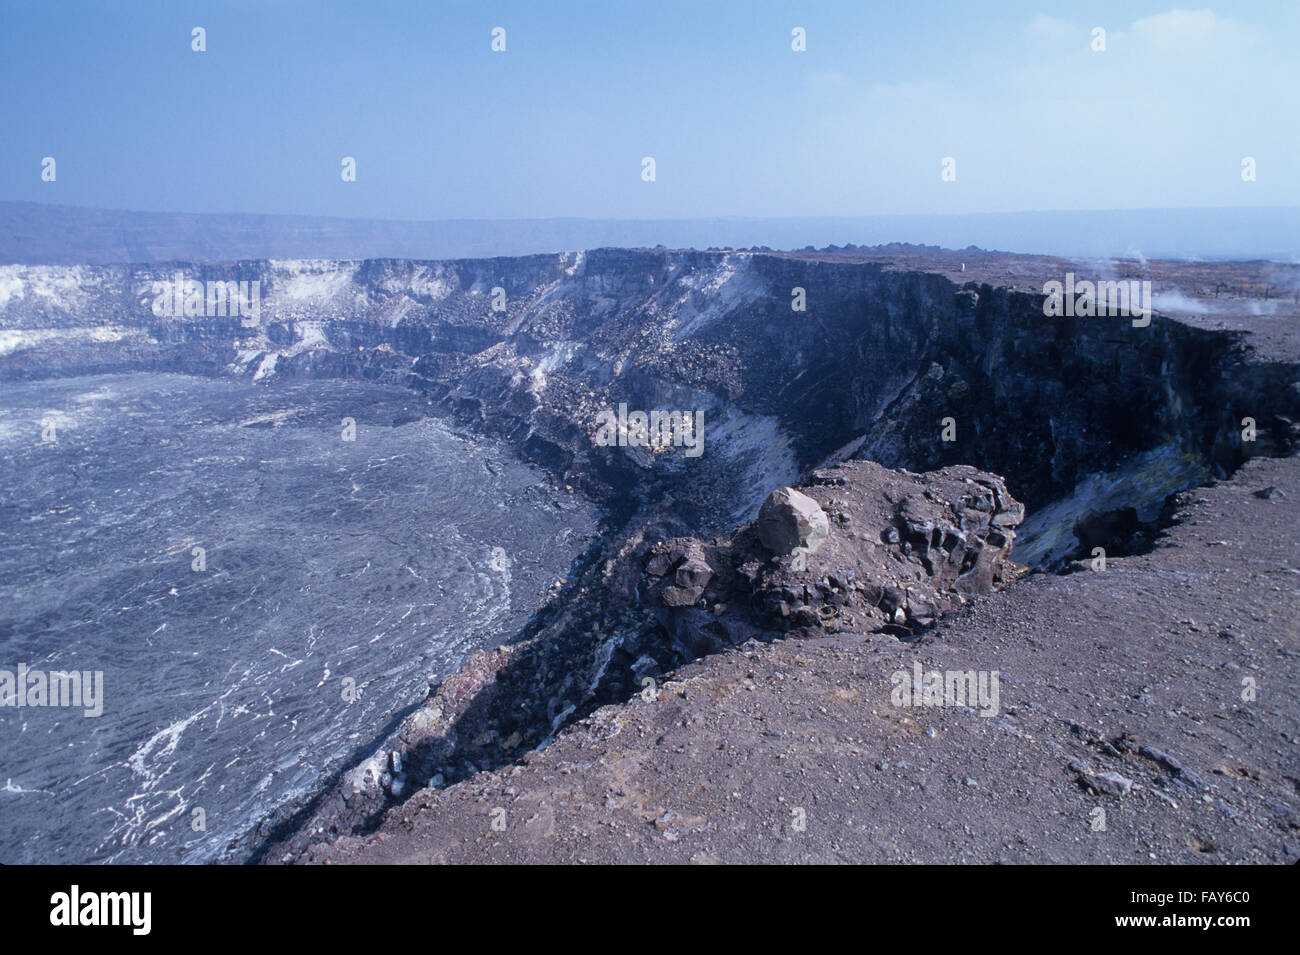 Big Island, Hawaii, Hawaii Volcanoes National Park, Halemaumau Crater rim view - Stock Image